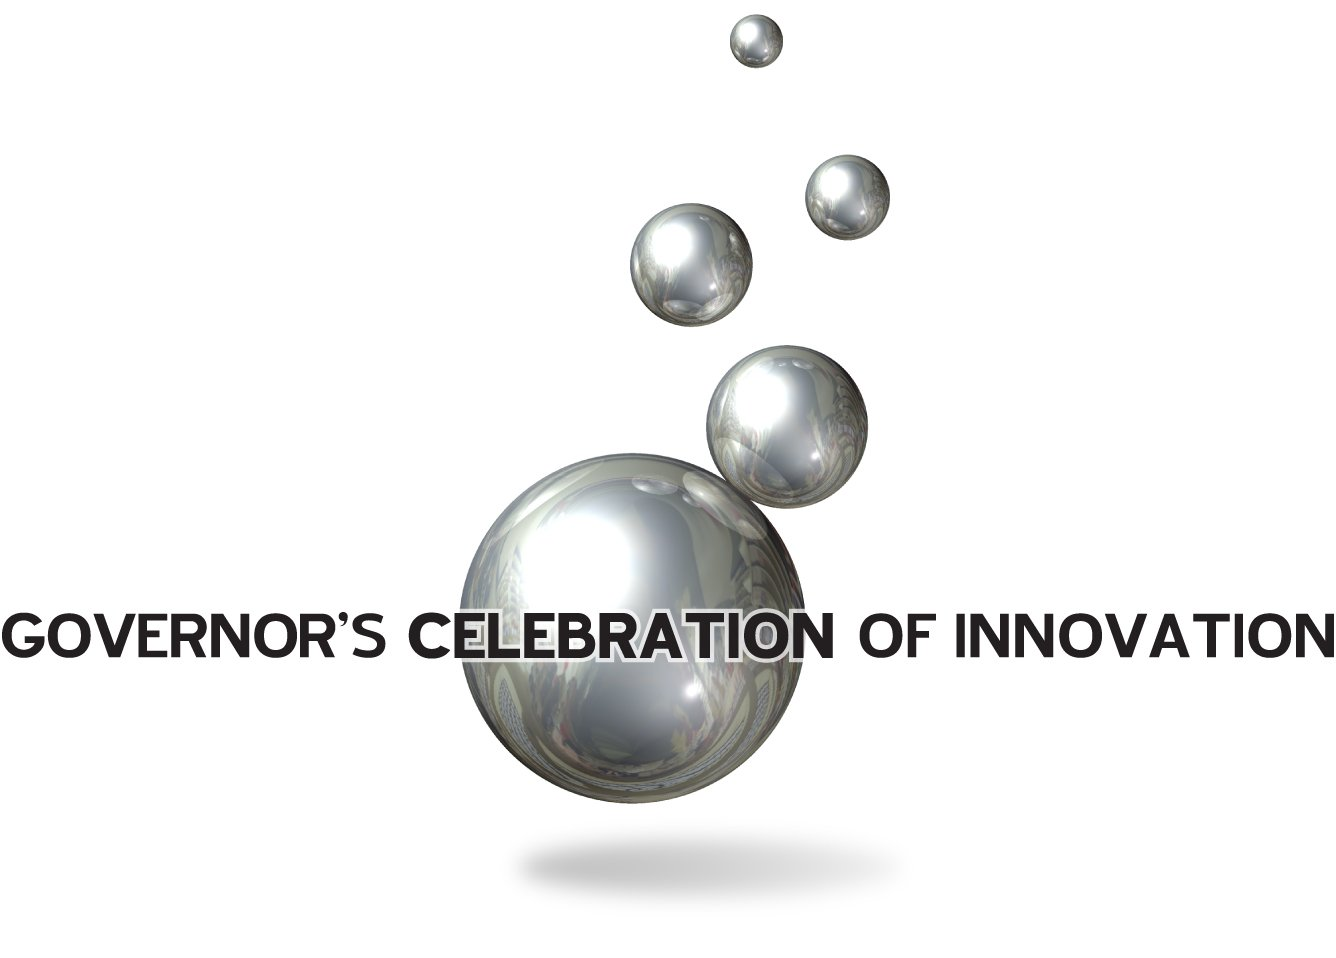 Governor's Celebration of Innovation